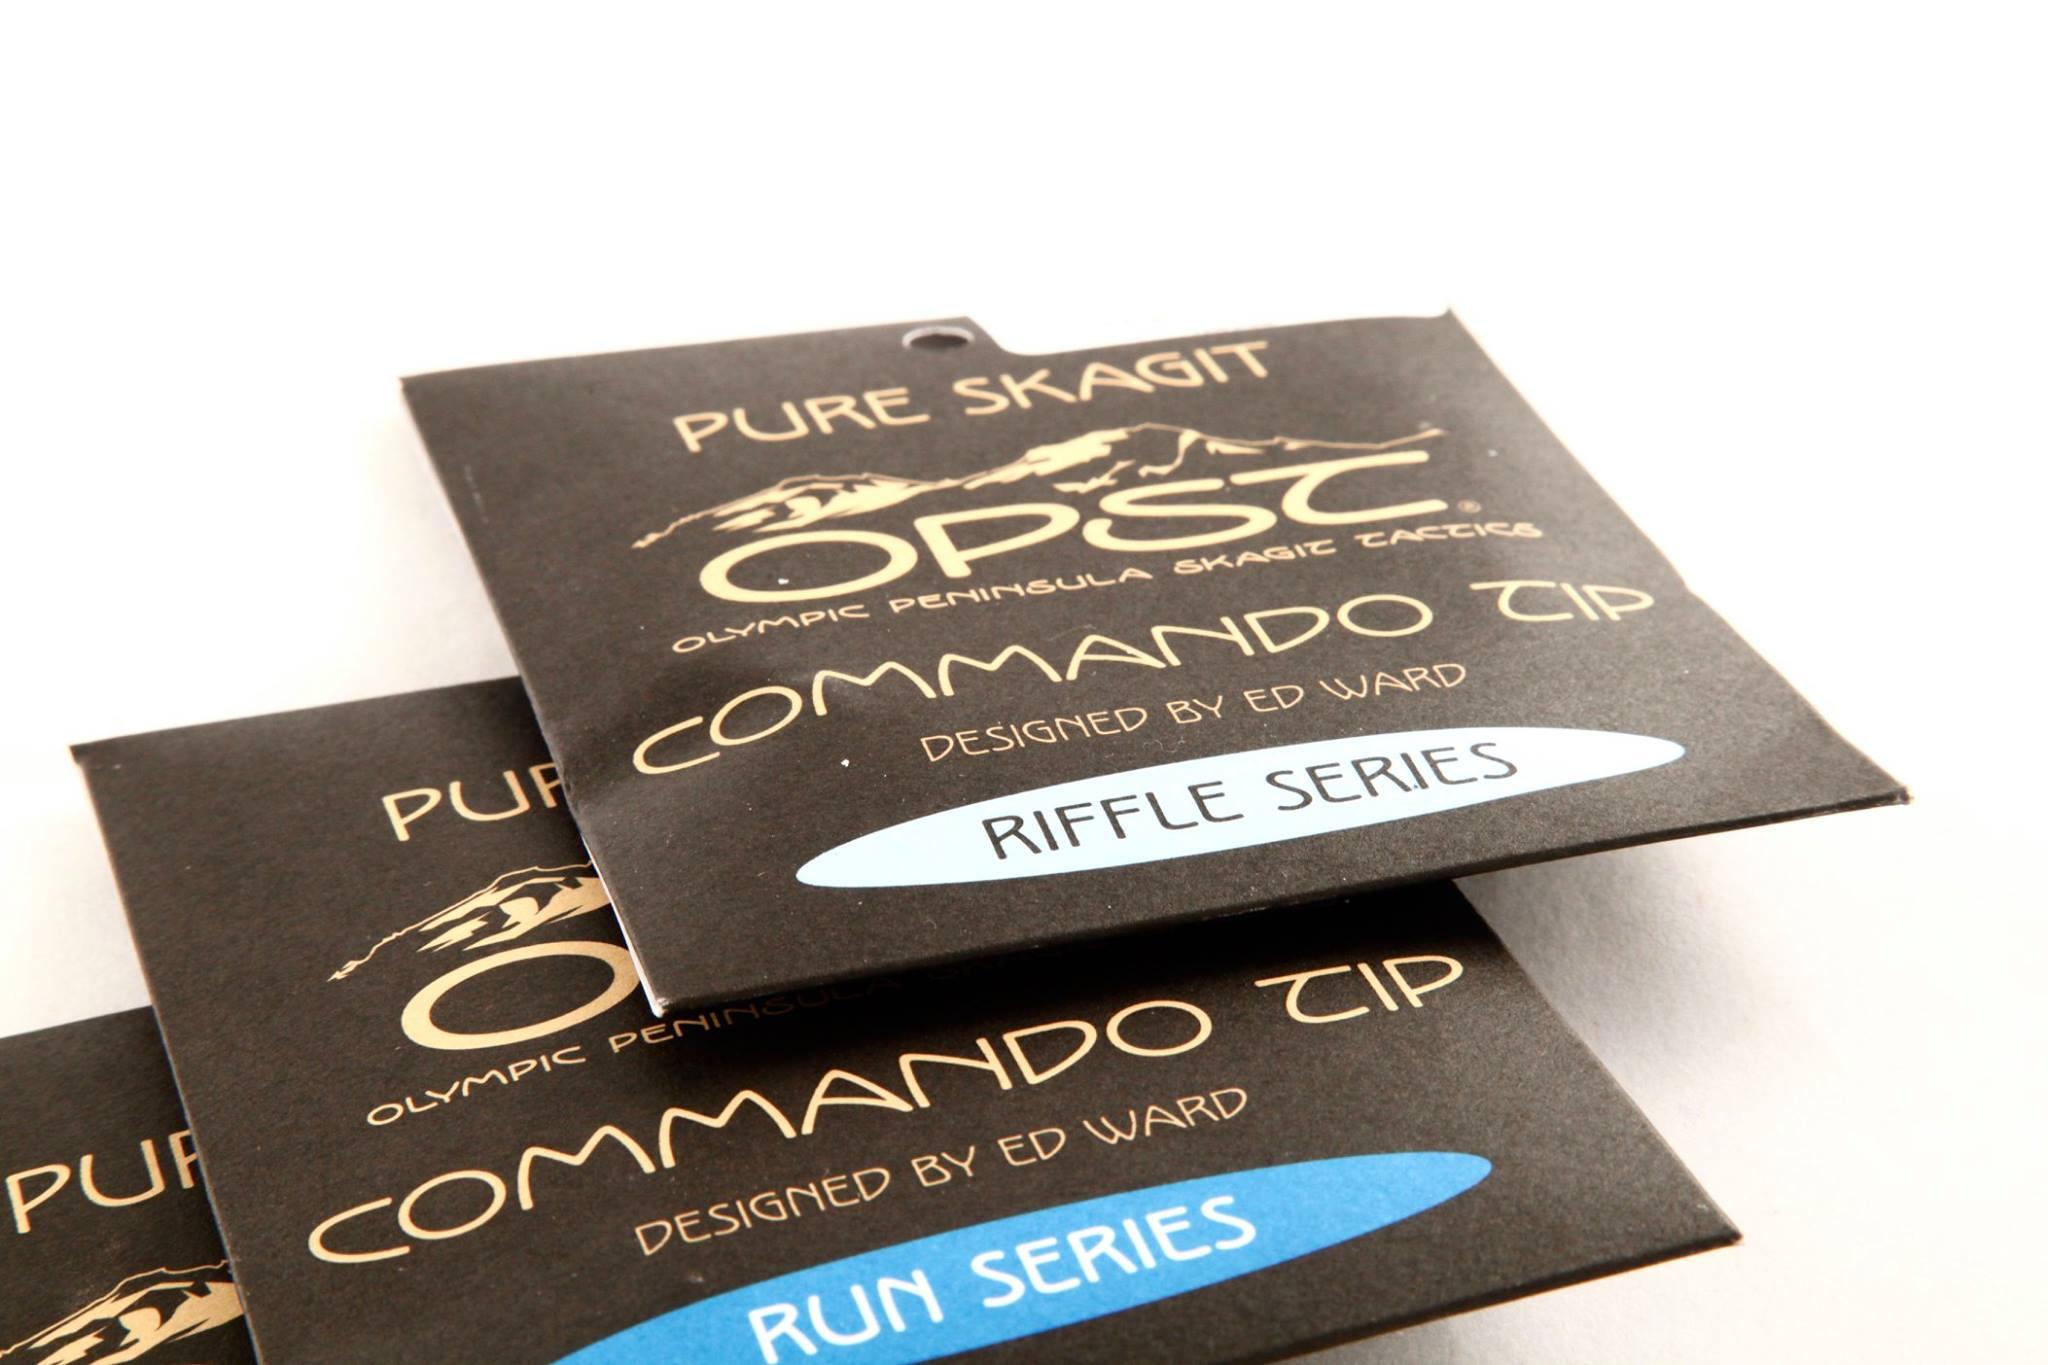 OPST Commando Tips A